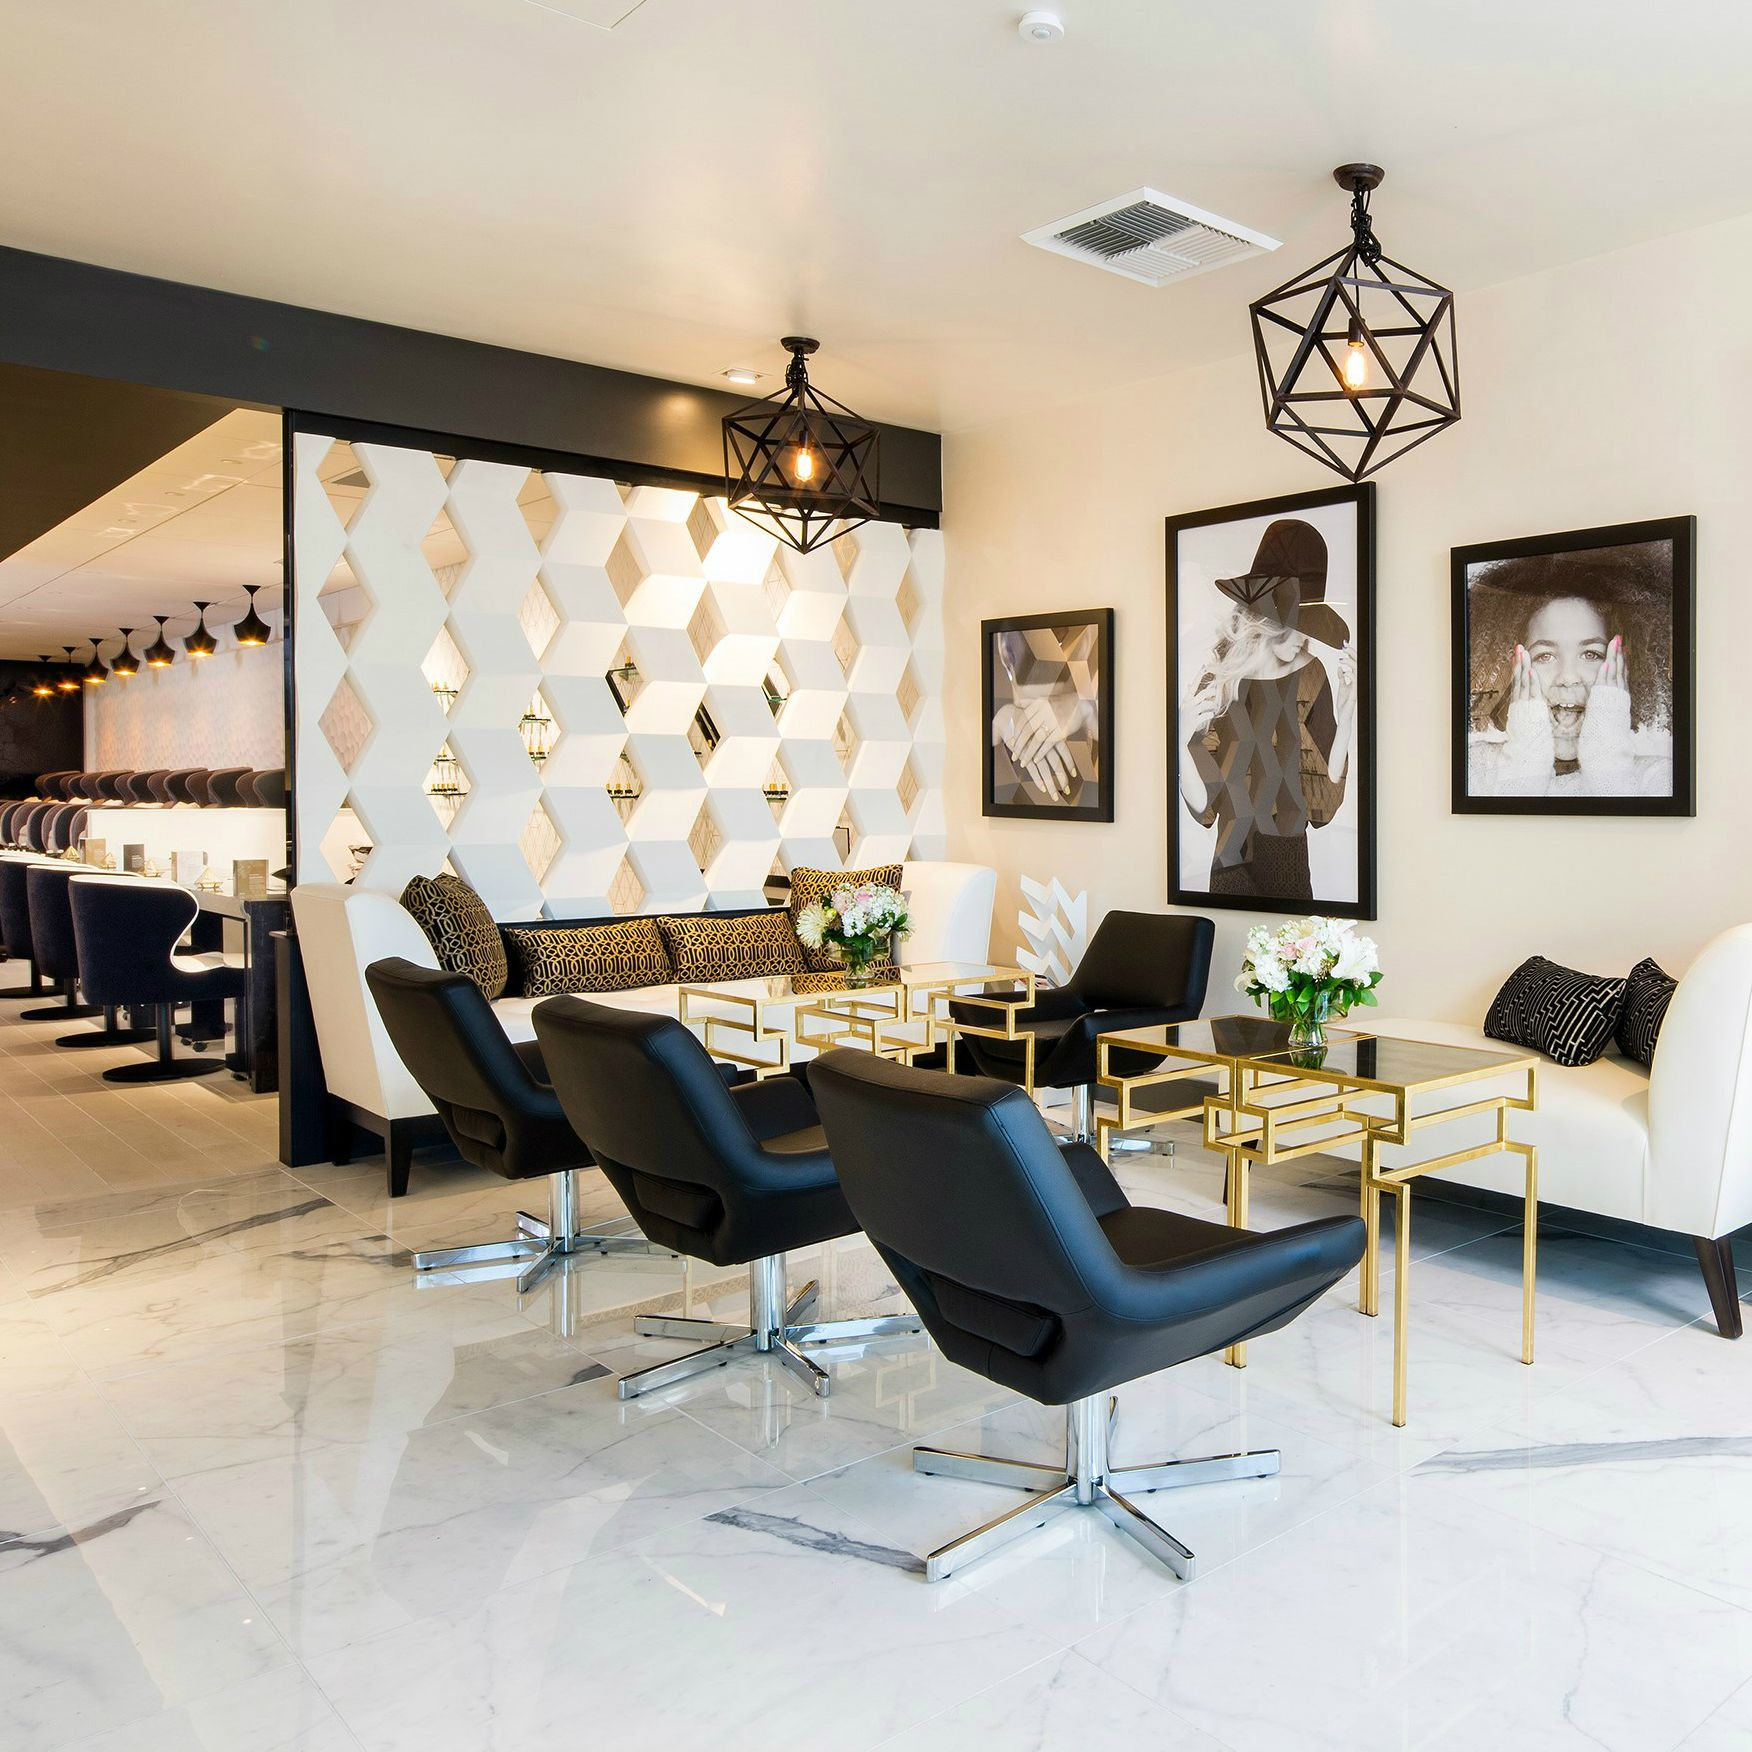 Studio Lounge  Salon Interior Inspiration  Nail salon decor Beauty salon interior Beauty